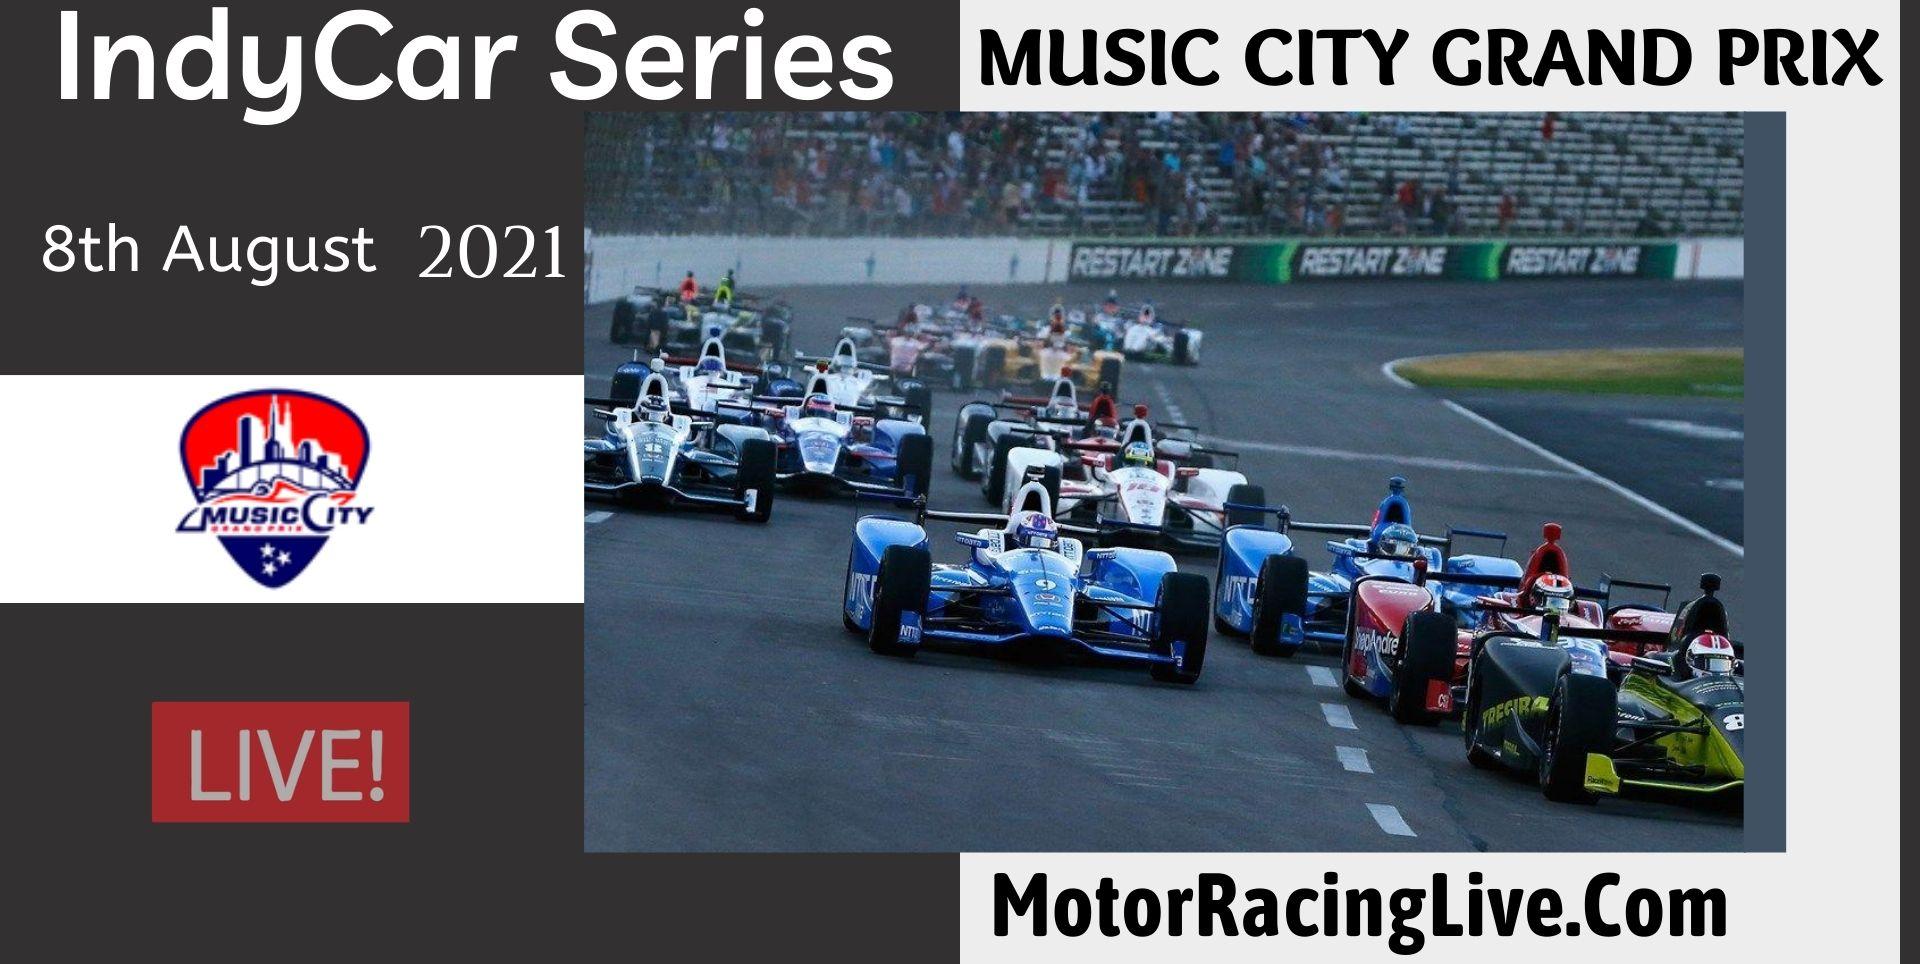 MUSIC CITY GRAND PRIX Live Stream 2021 | Indycar